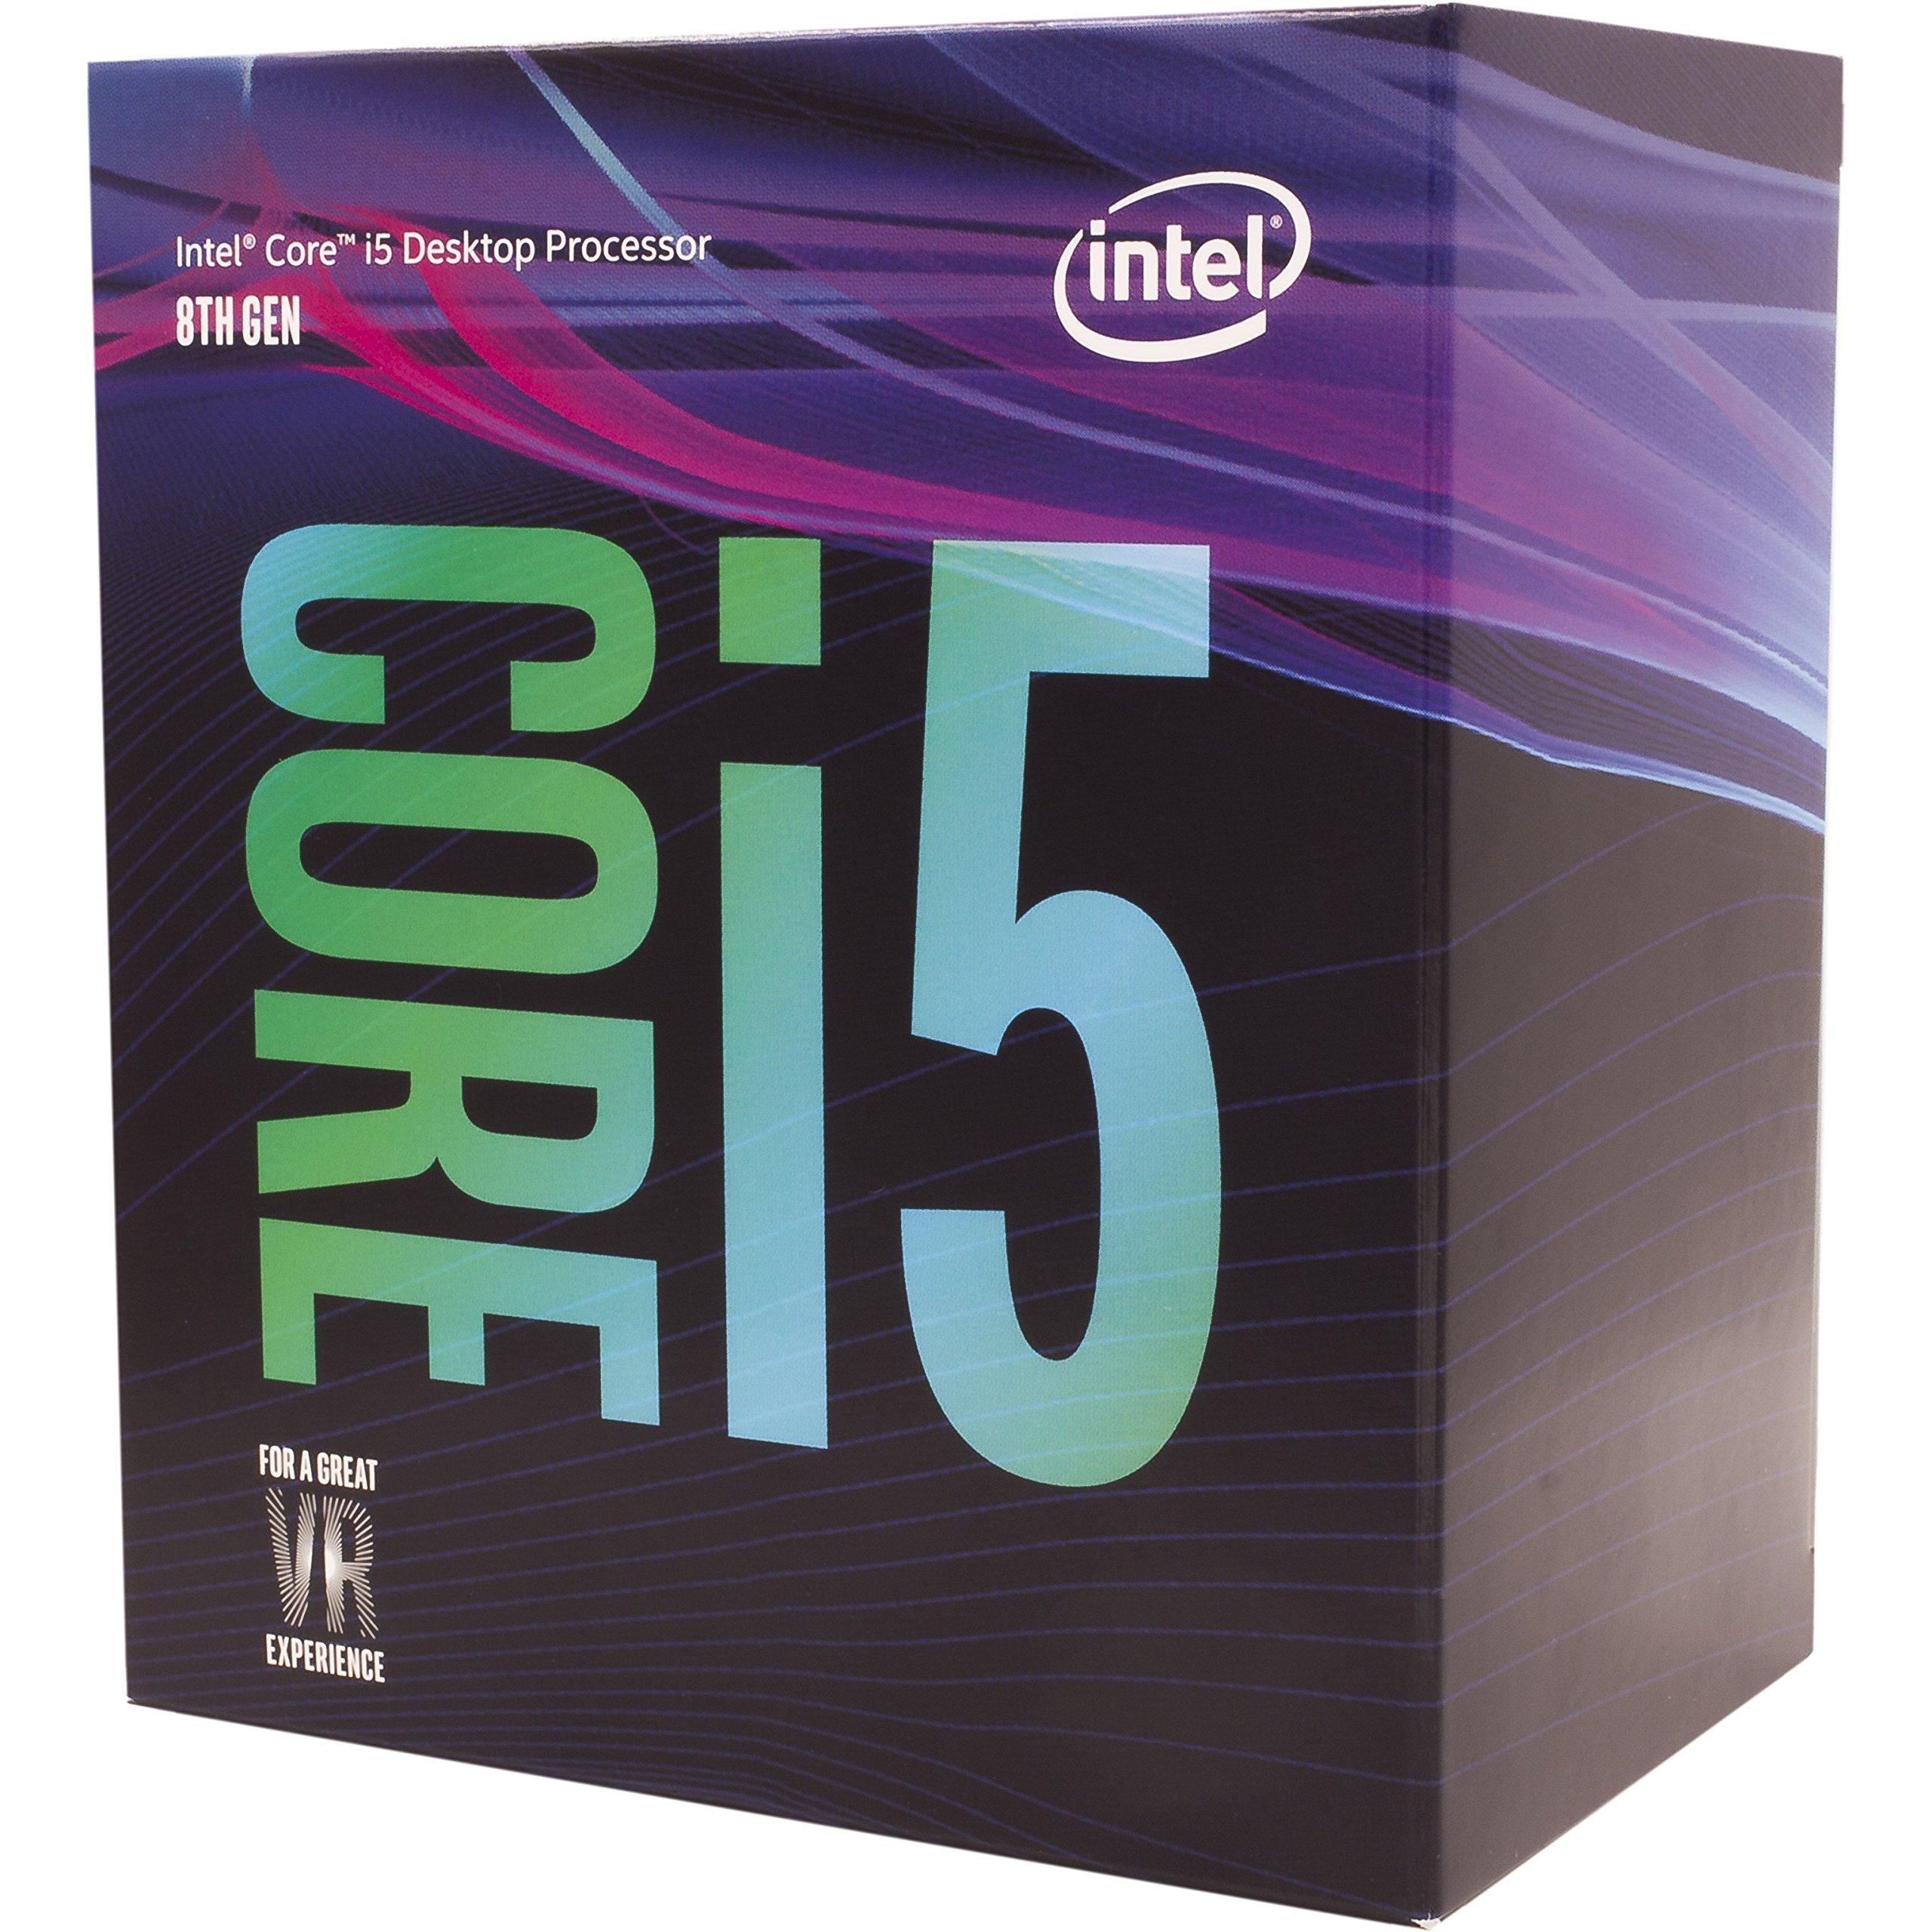 Intel Core i3-8100 Processeur de Bureau 4 cœurs 3,6 GHz LGA1151 300 Series 65W BX80684i38100